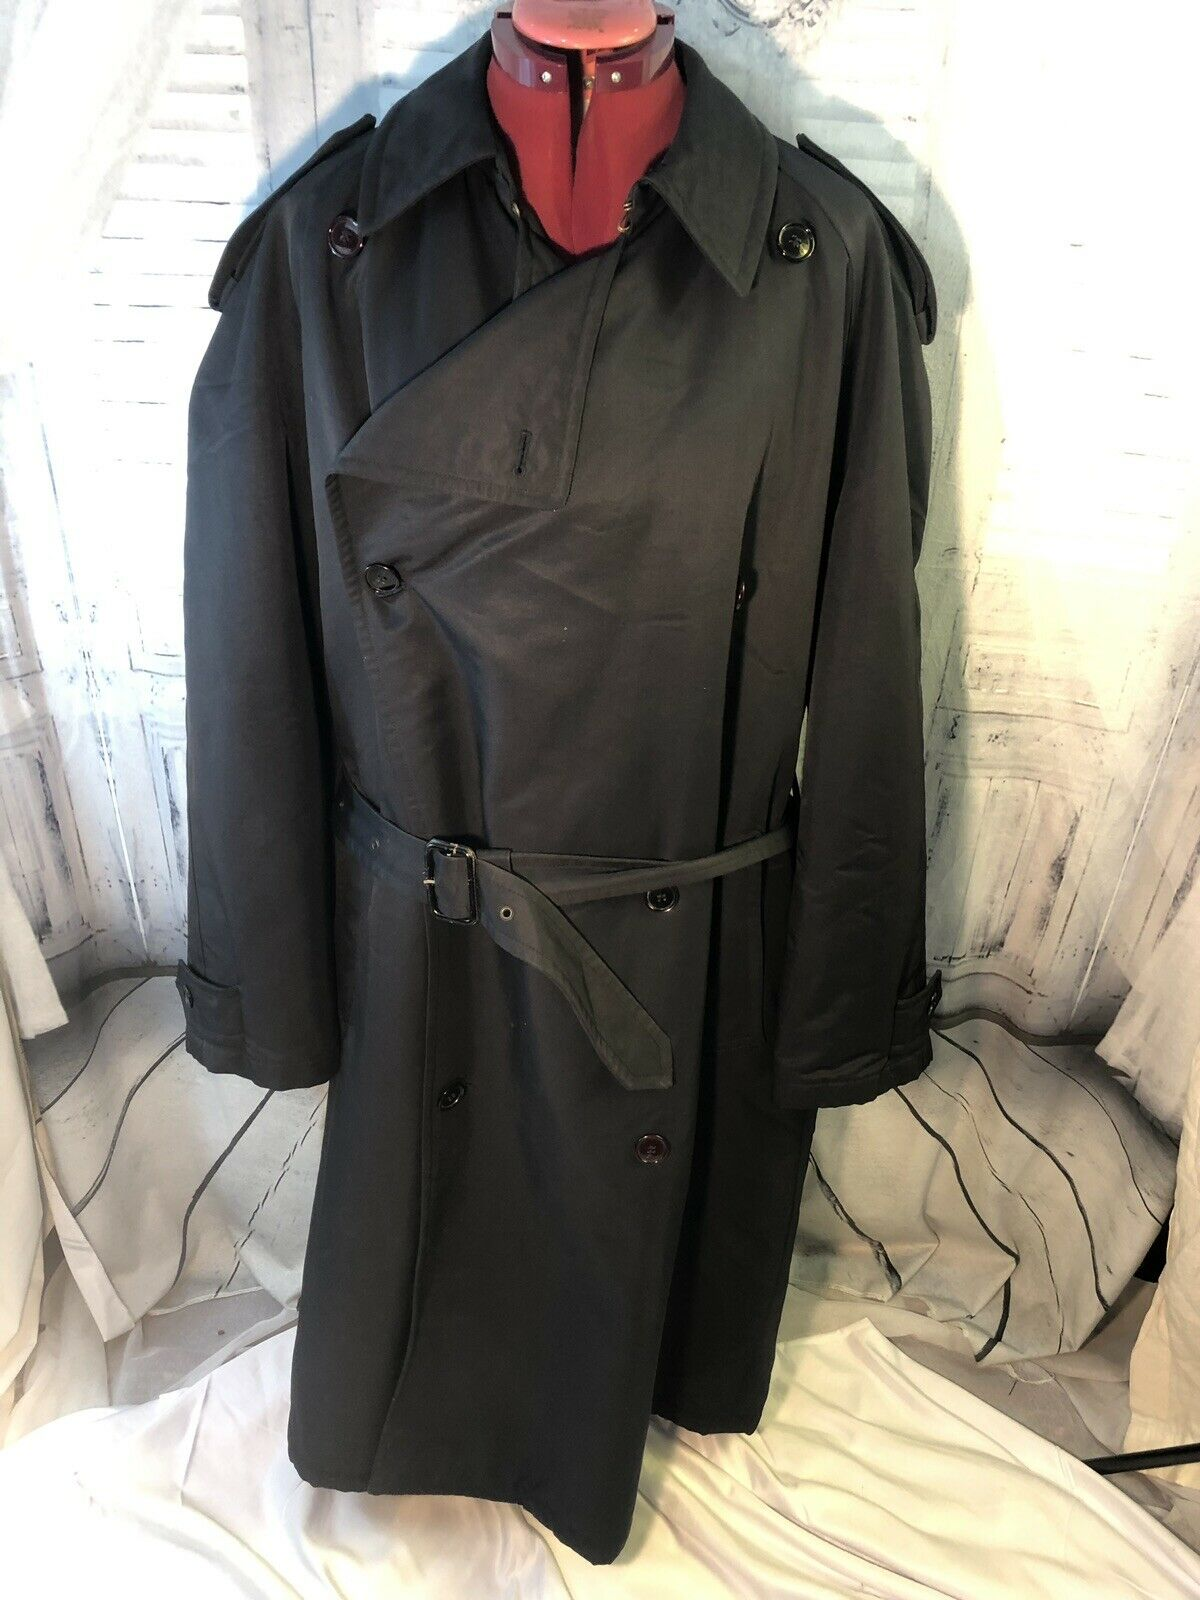 STUDIO 0001 FERRE Italian Men's Trench Coat Size 40R Blk Like New   SUPER DEAL